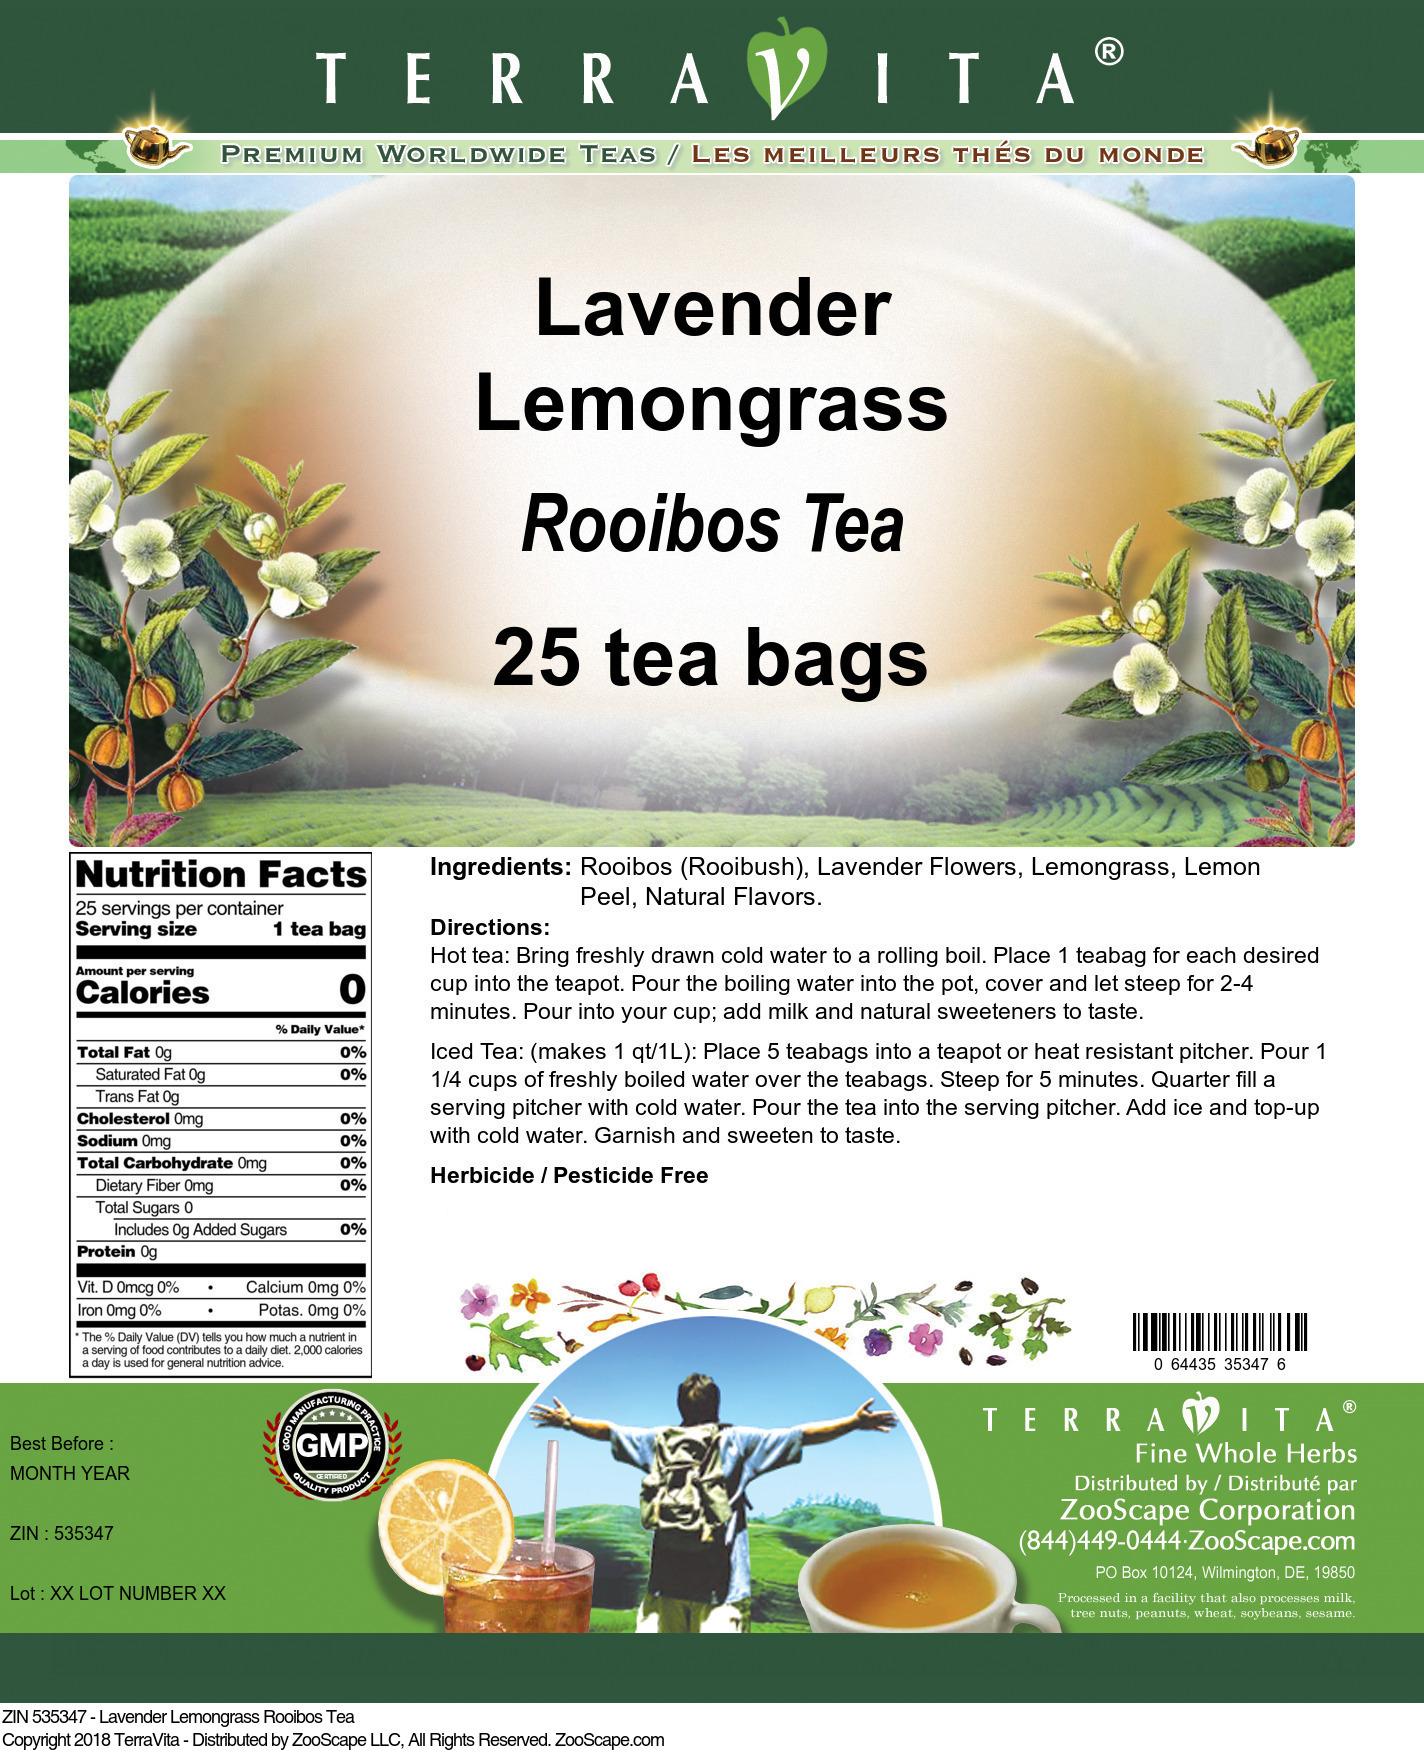 Lavender Lemongrass Rooibos Tea